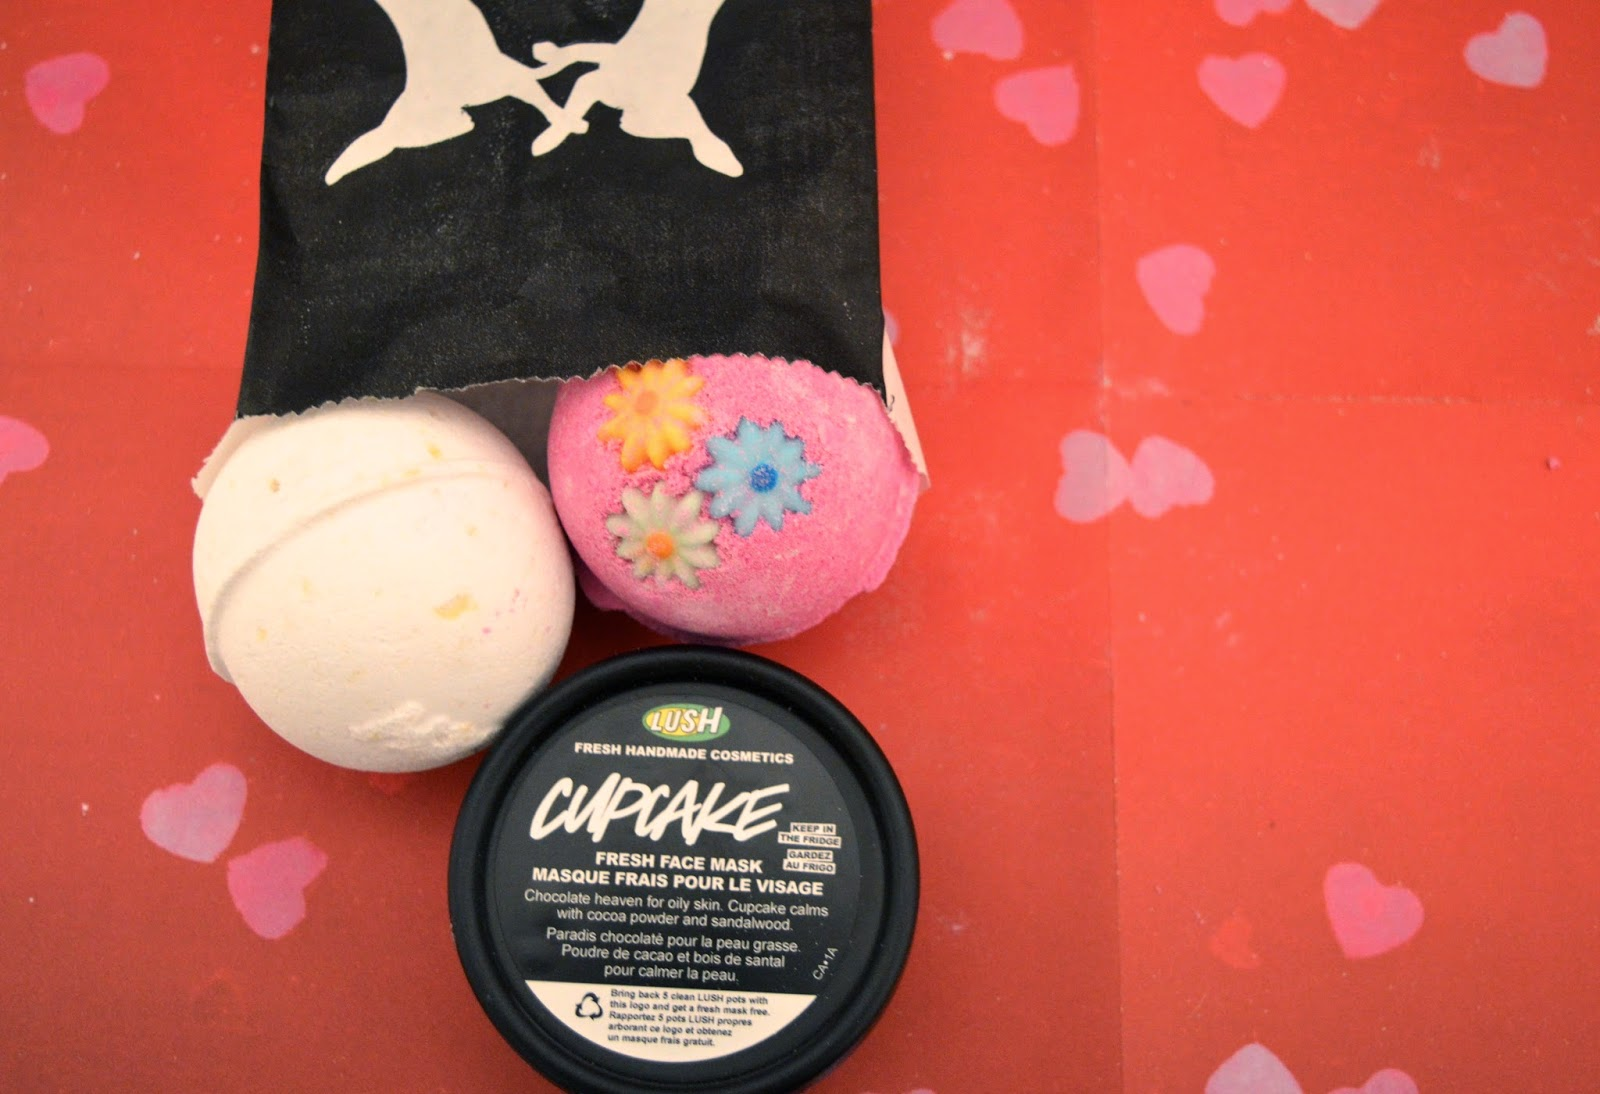 Lush, Lush Haul, Lush Bath Bomb, Lush Bath Bombs, Lush Face Mask